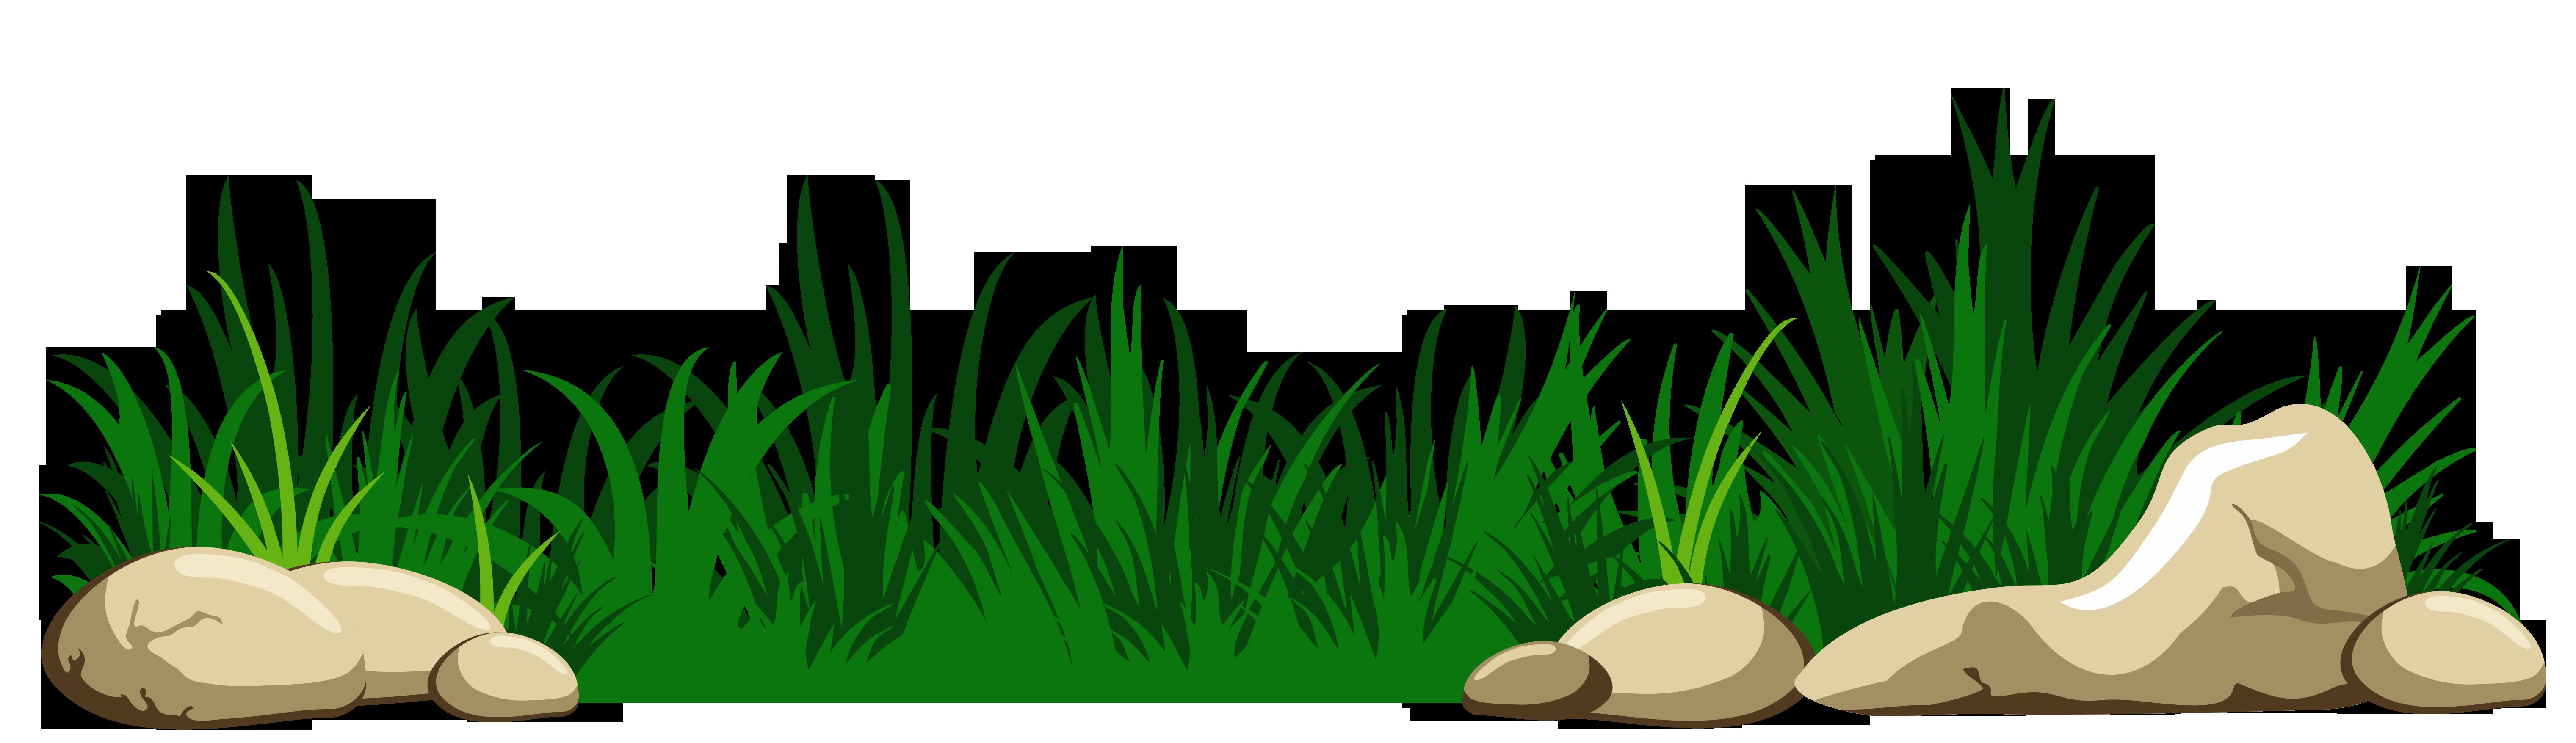 Safari Grass Clipart.